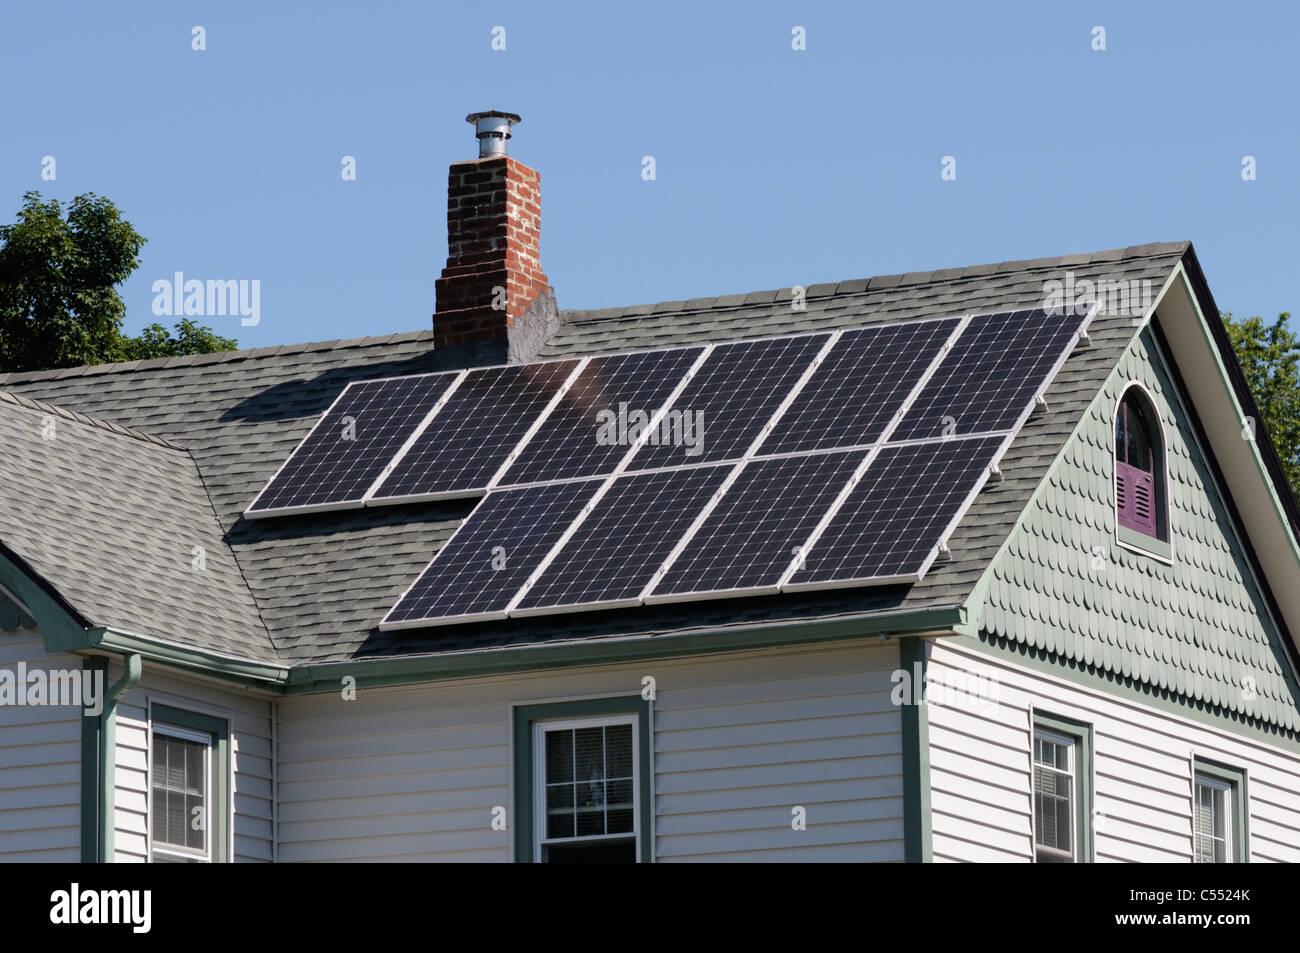 Photovoltaik-Solarzellen am Dach des Hauses Stockbild